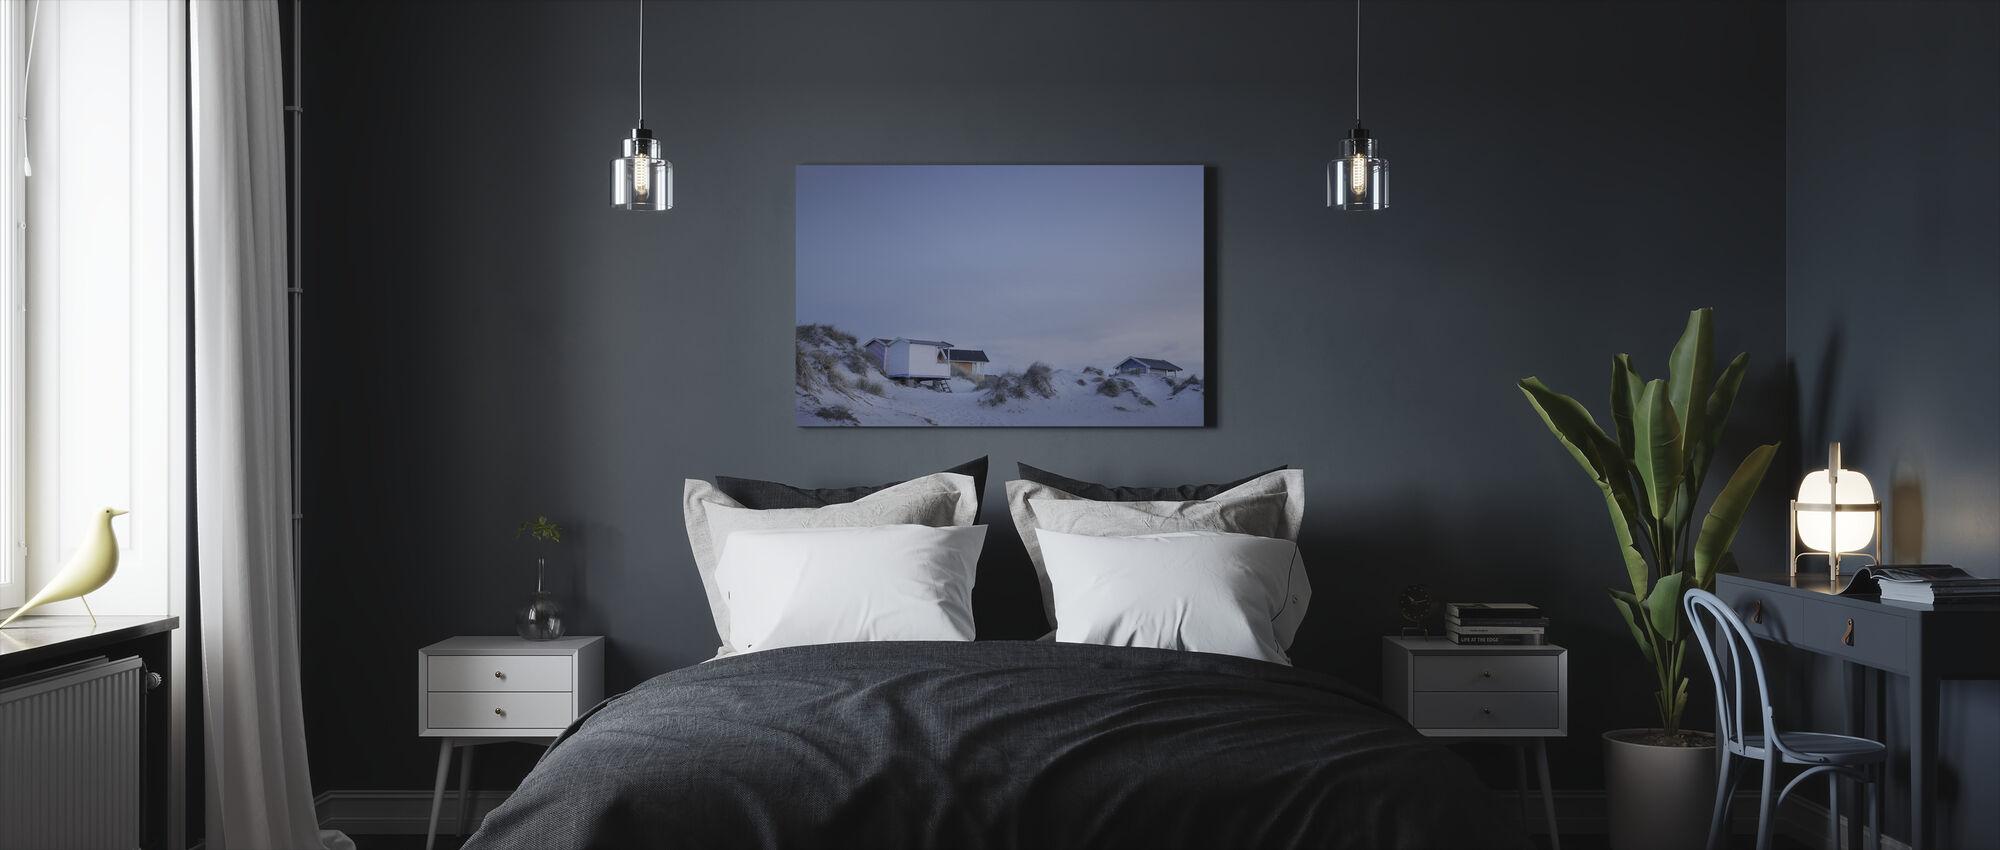 Cabana at Beach in Skåne, Sweden - Canvas print - Bedroom